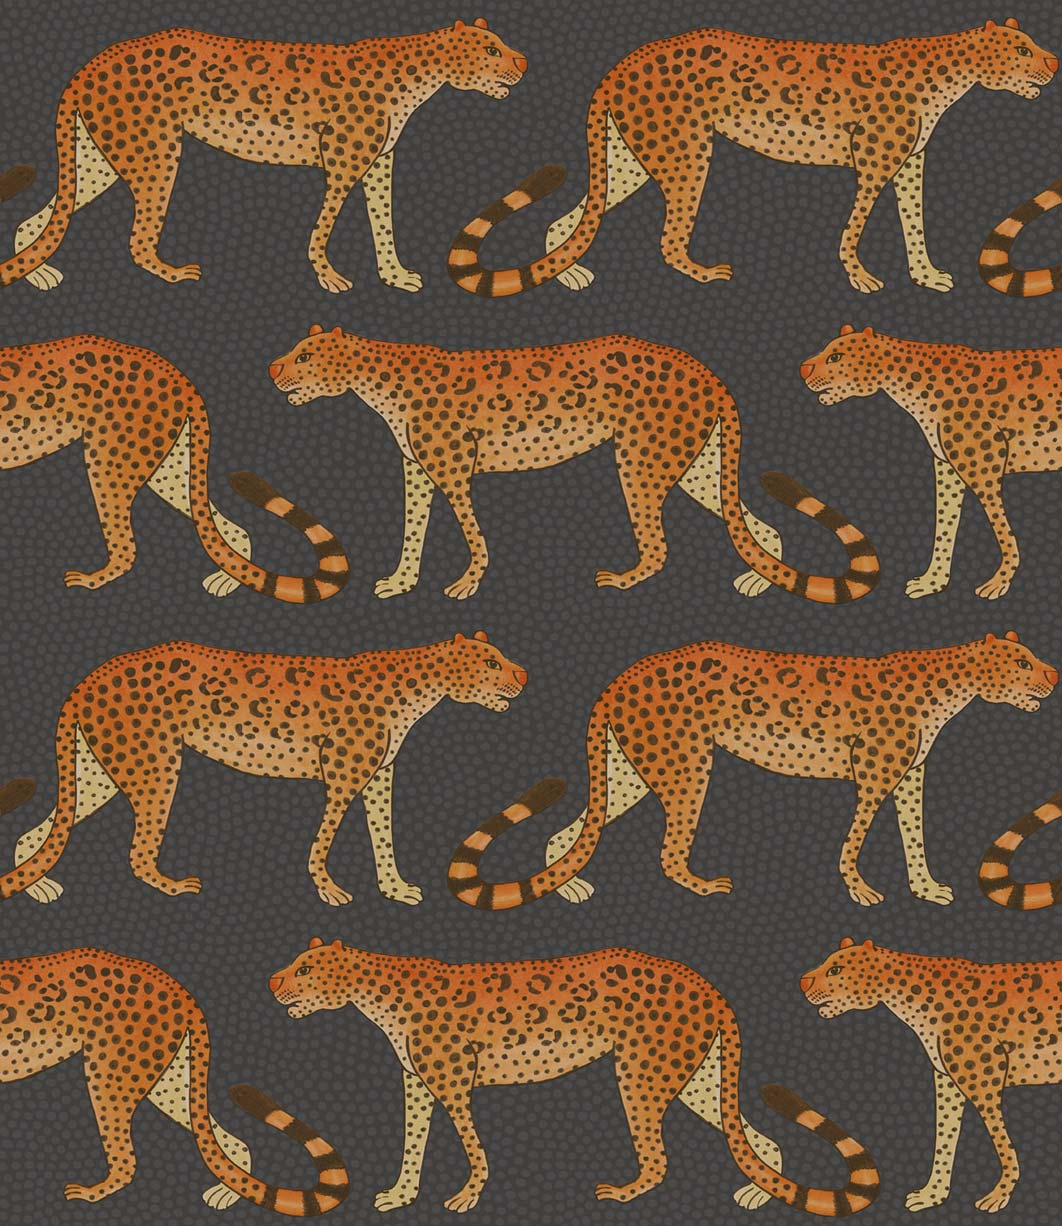 Leopard Walk Cole Son Lampshade In Jet Black